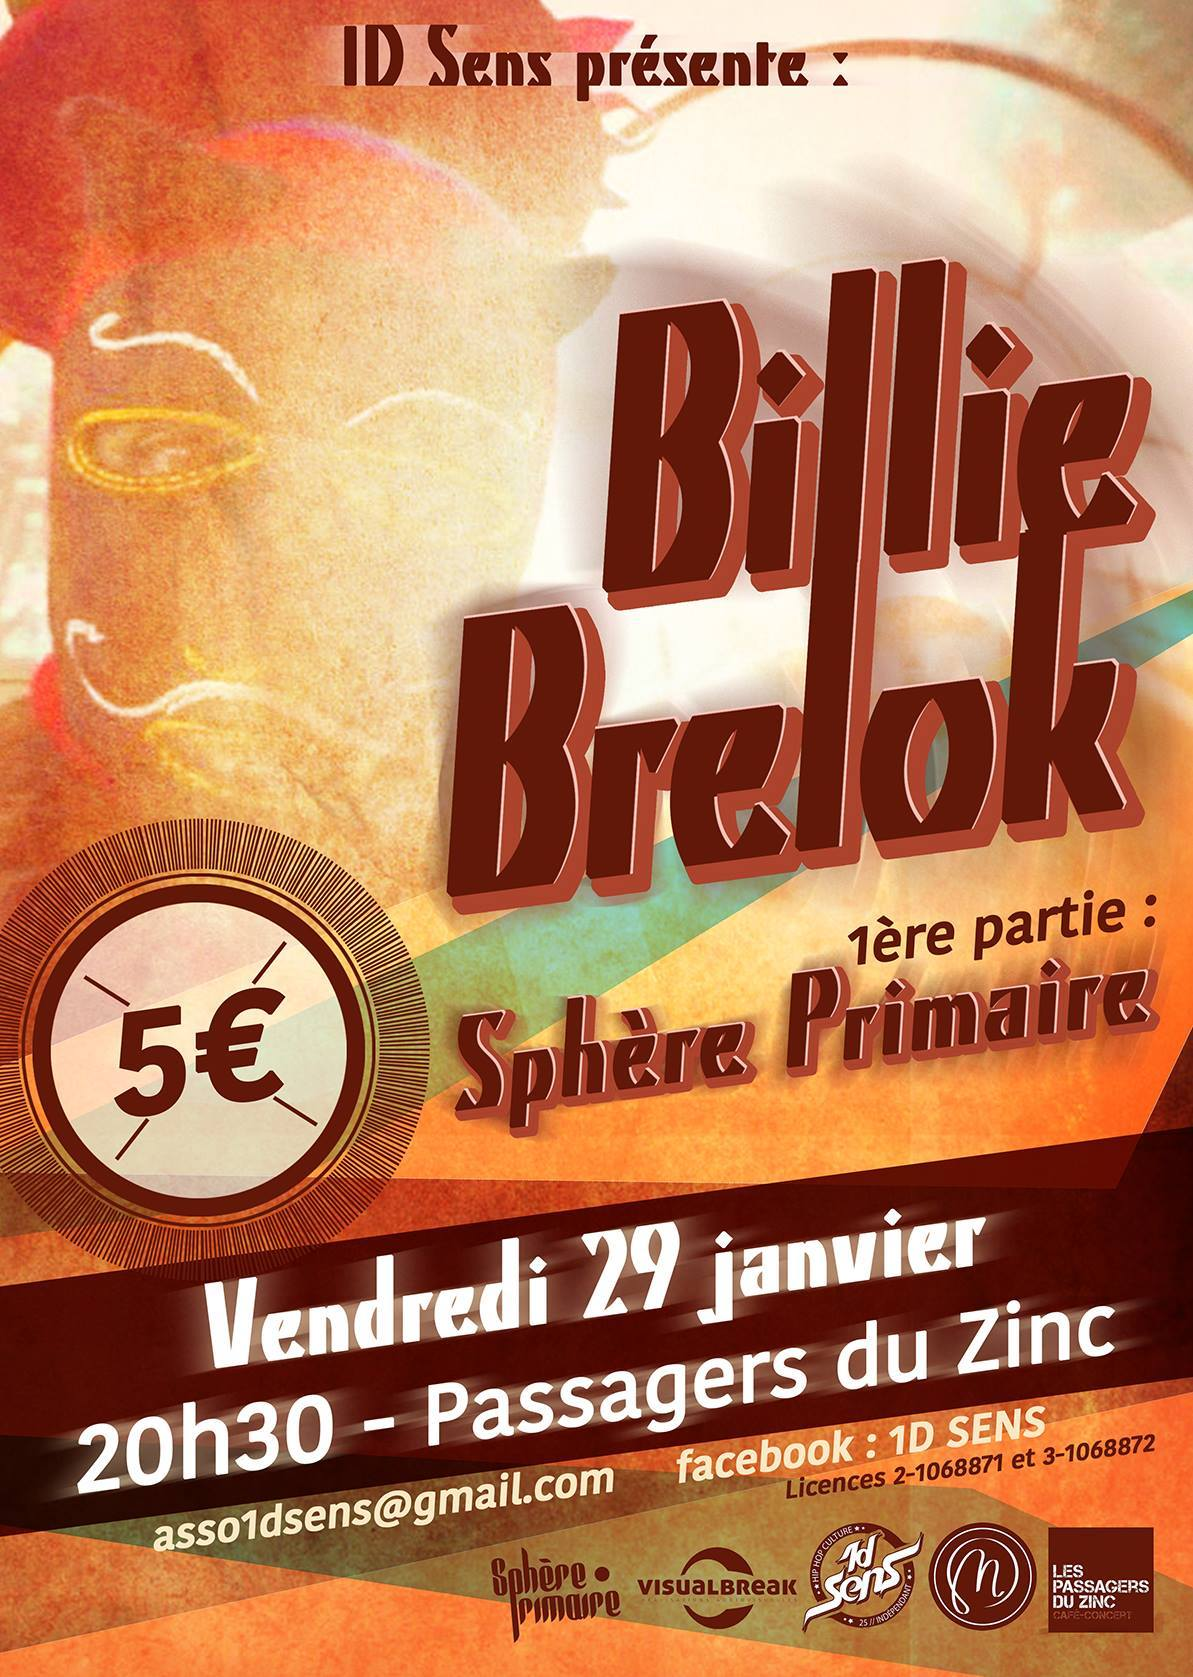 Billie Brelok